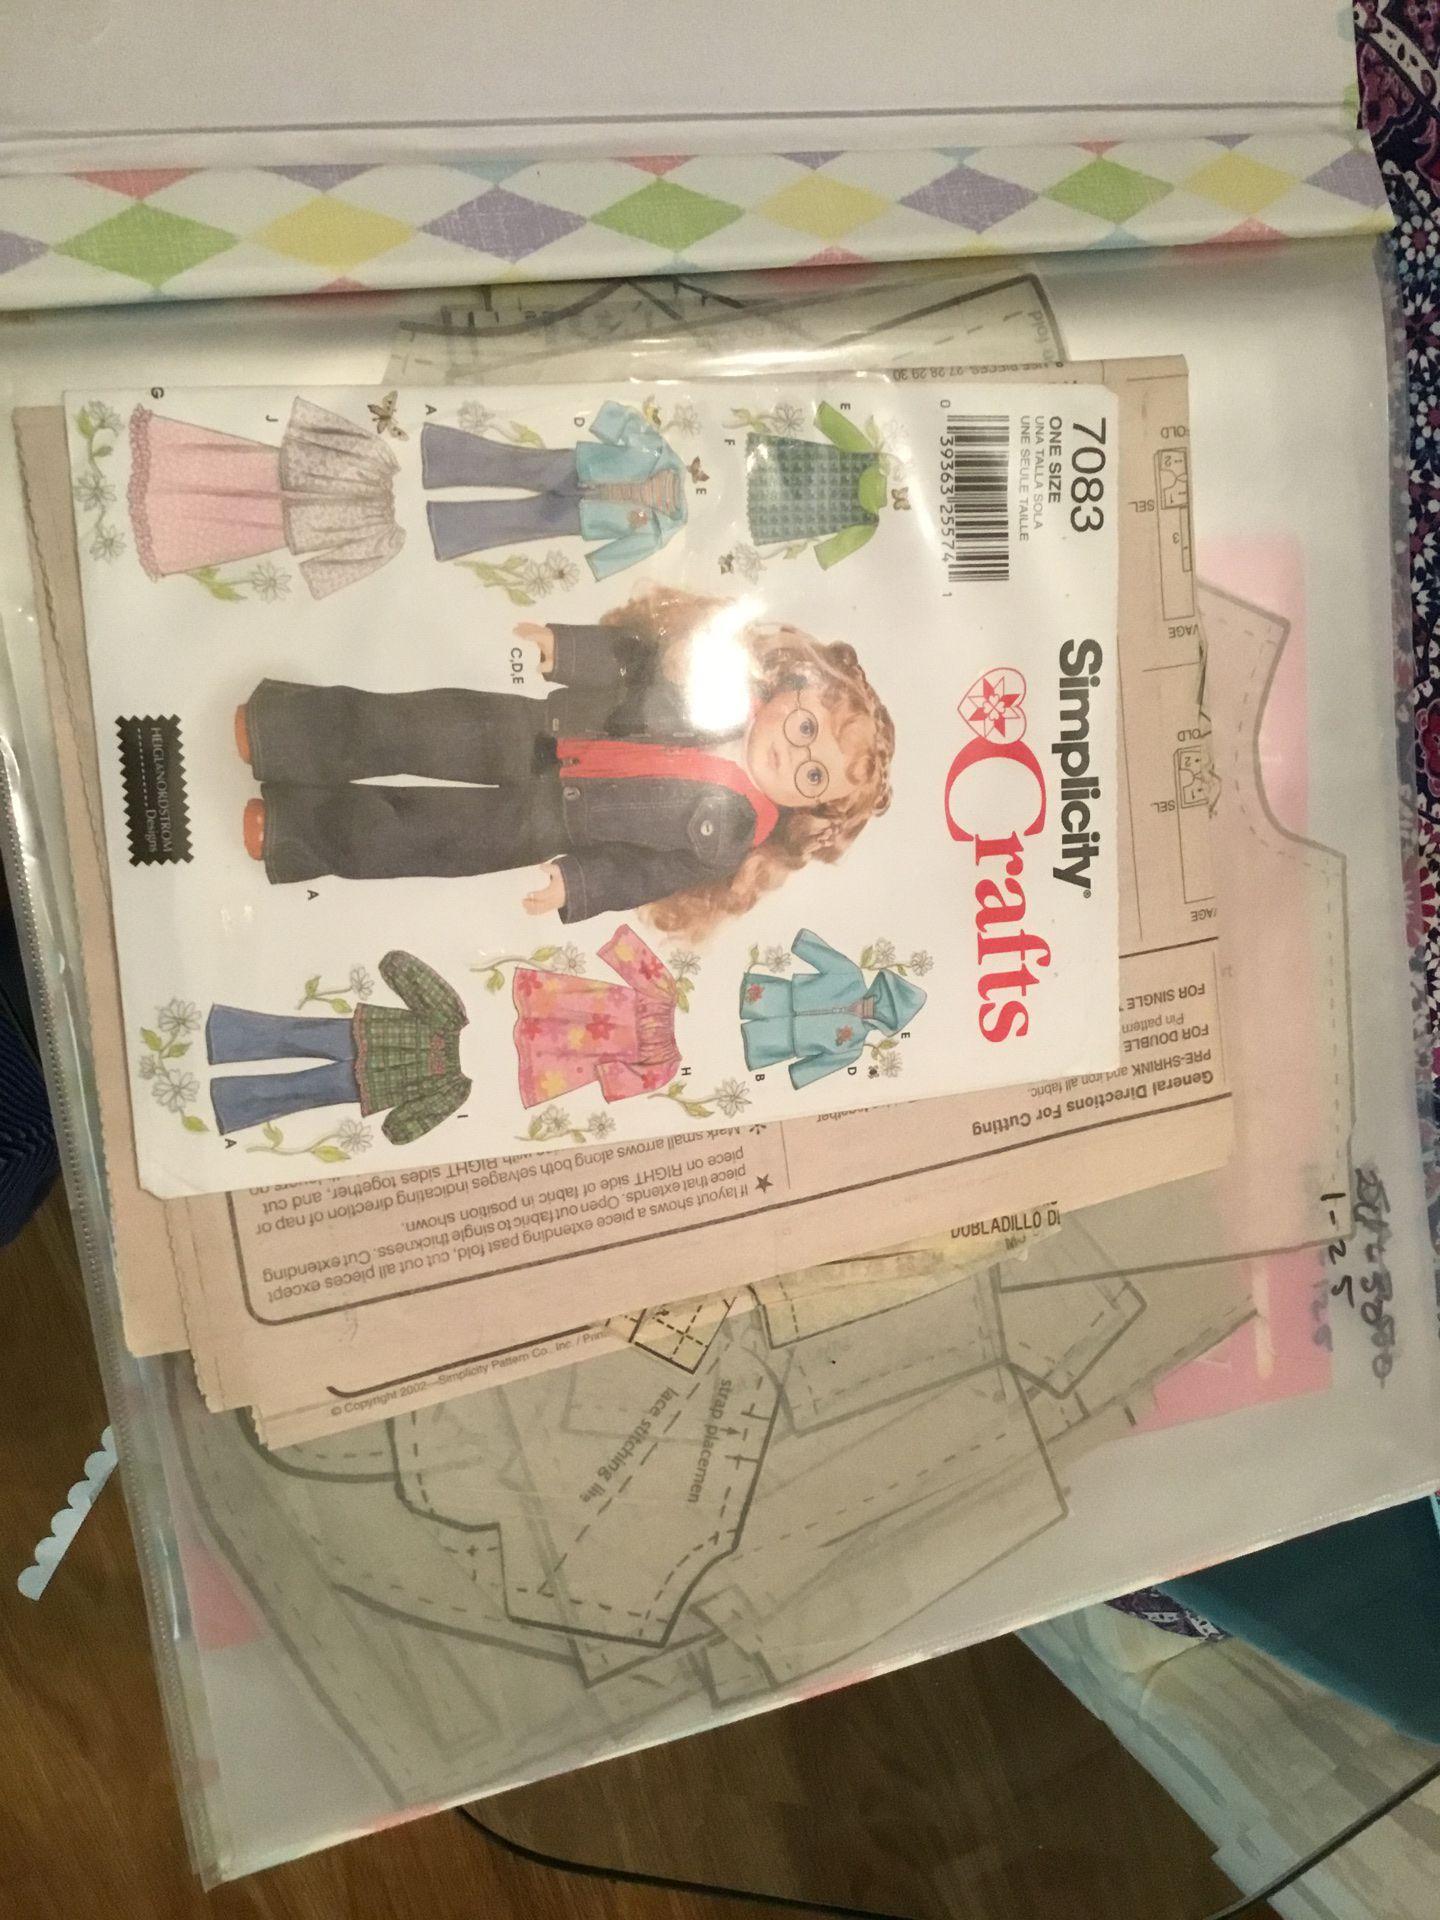 12 x 12 scrapbook of doll patterns